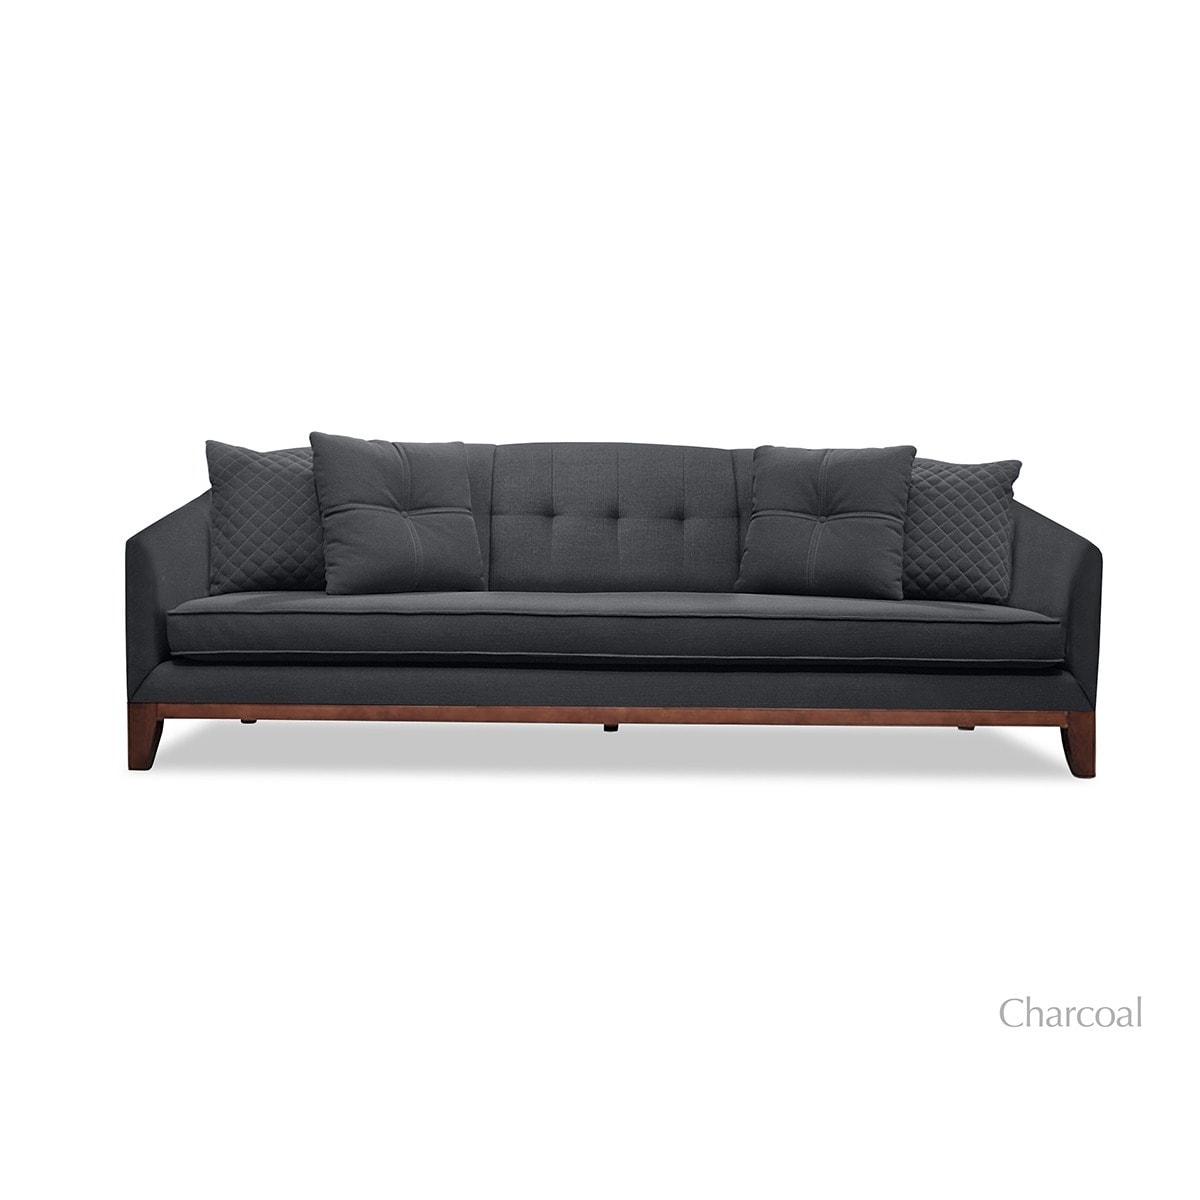 Incredible Lois Mid Century Tufted Linen Sofa Machost Co Dining Chair Design Ideas Machostcouk